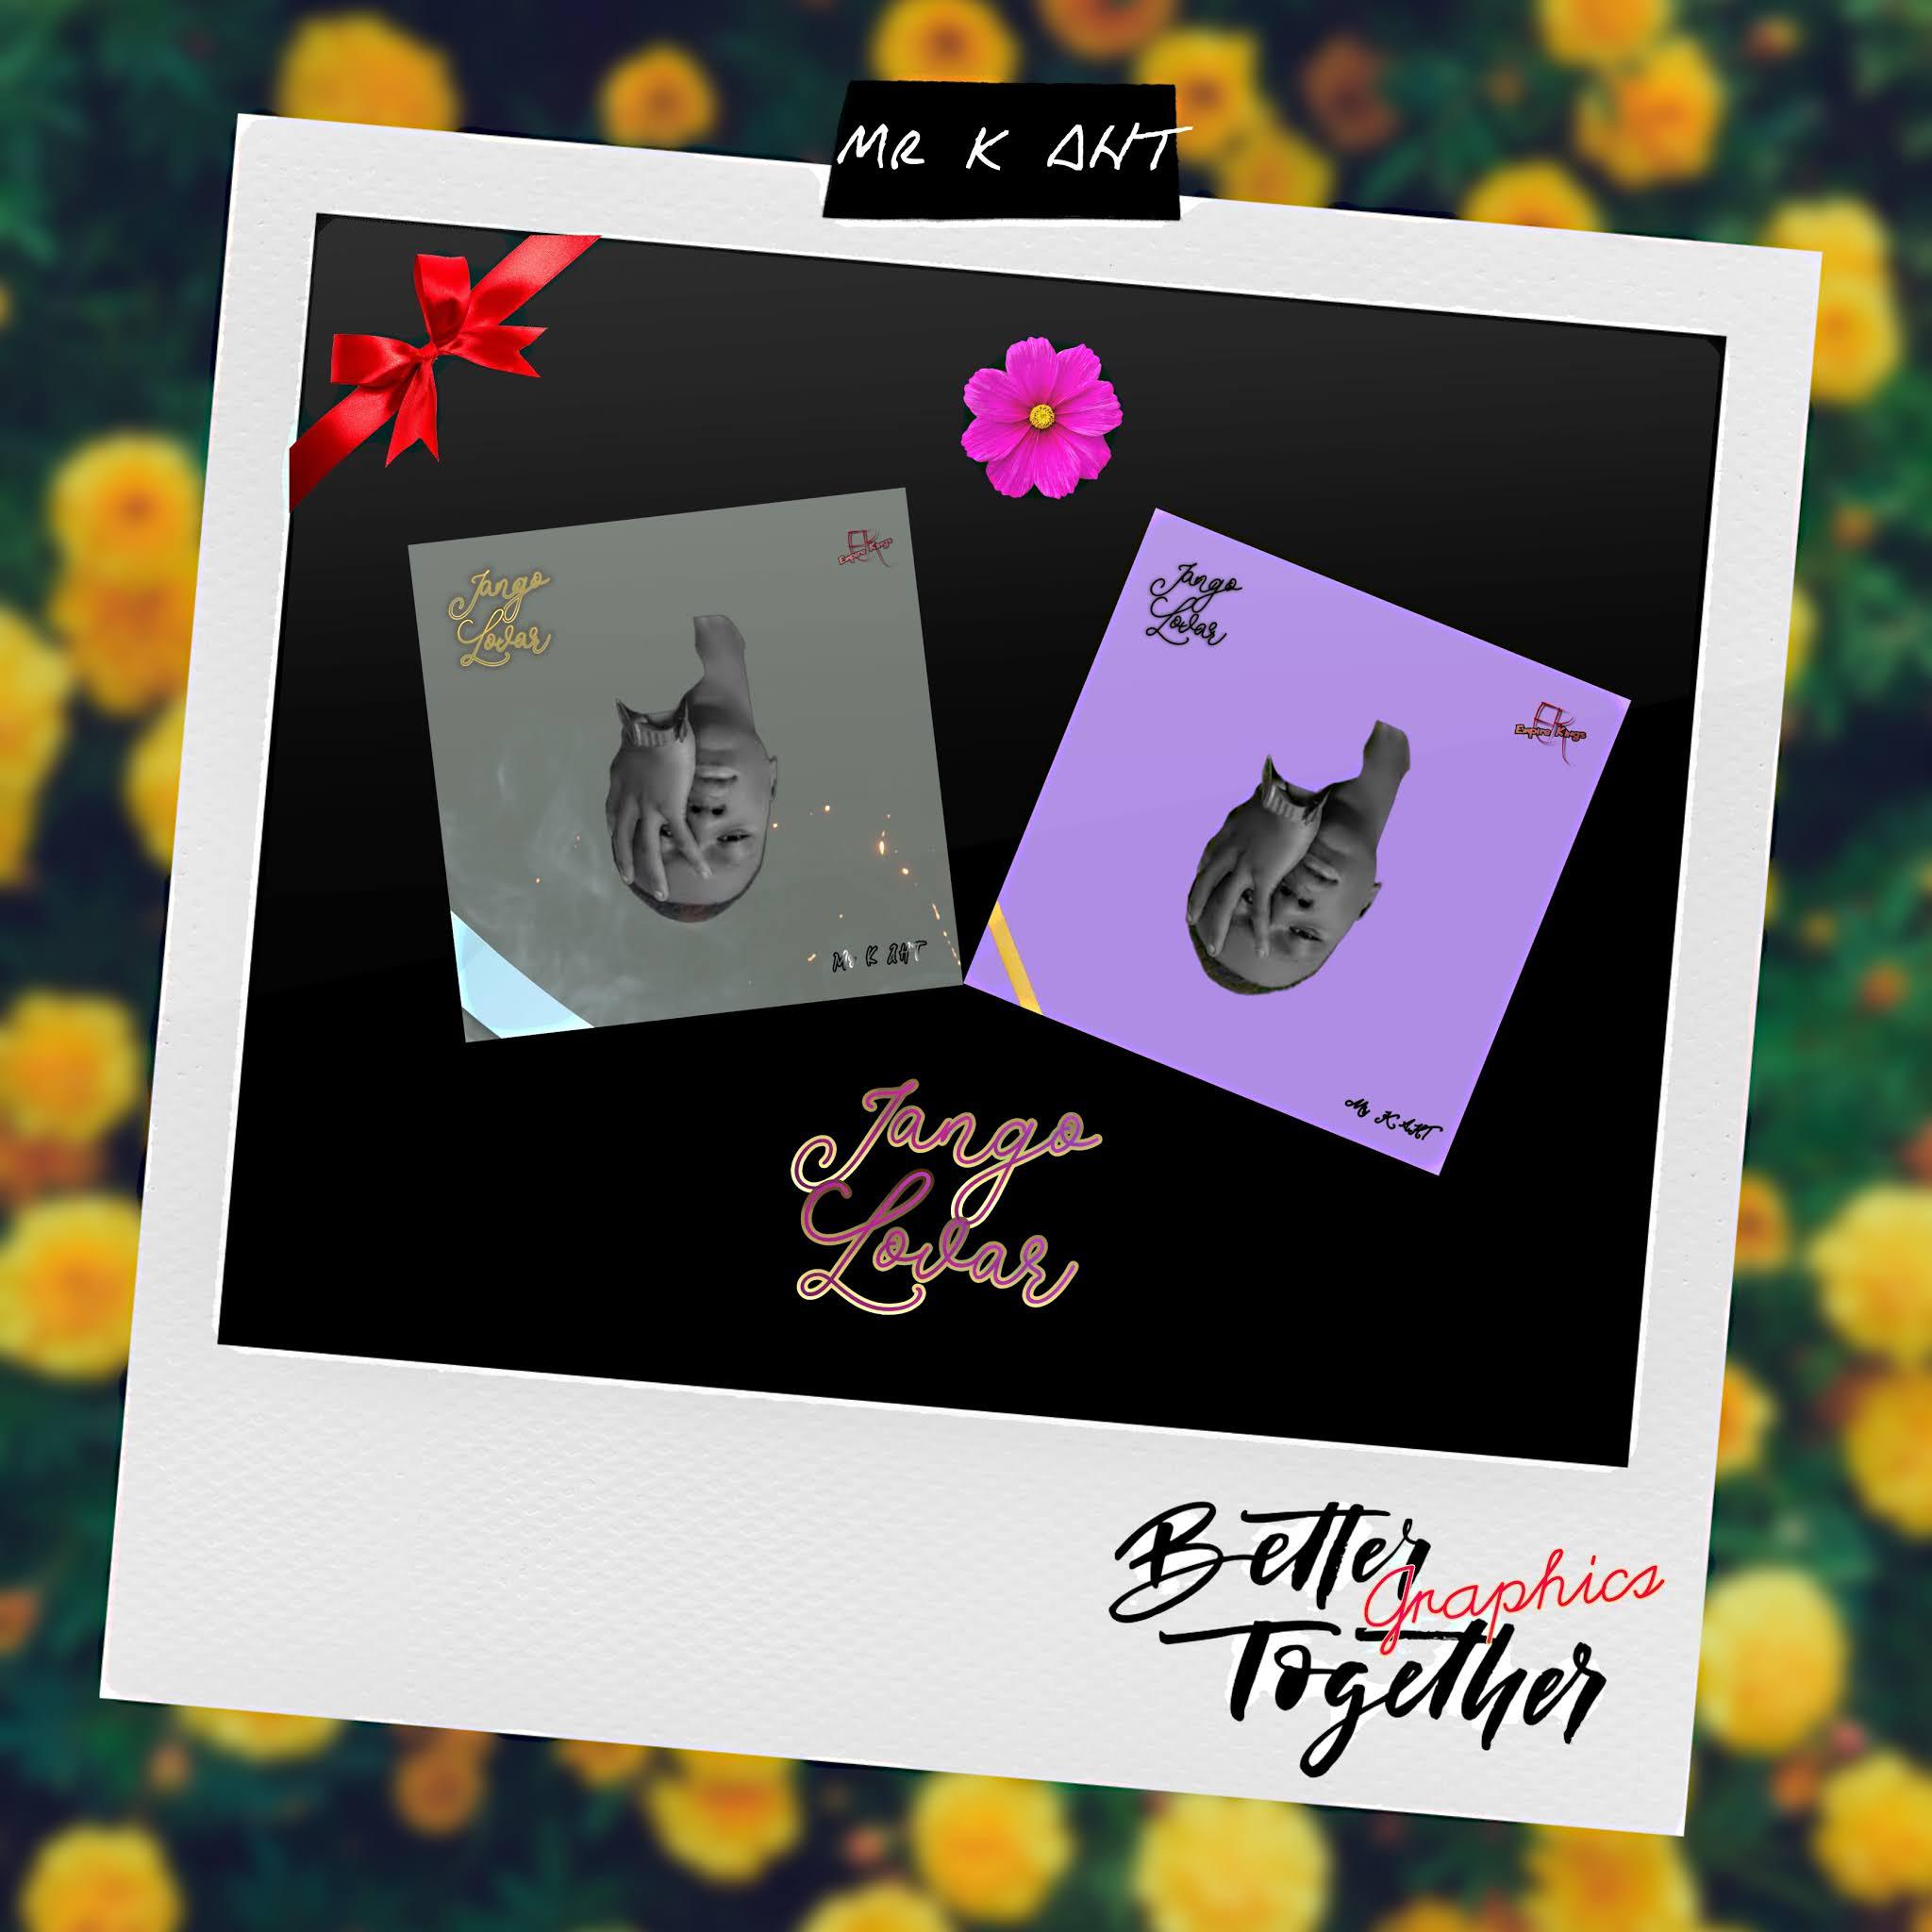 [Music] Mr. K AHT - Jangolover (prod. by mr. Timz) #hypebenue